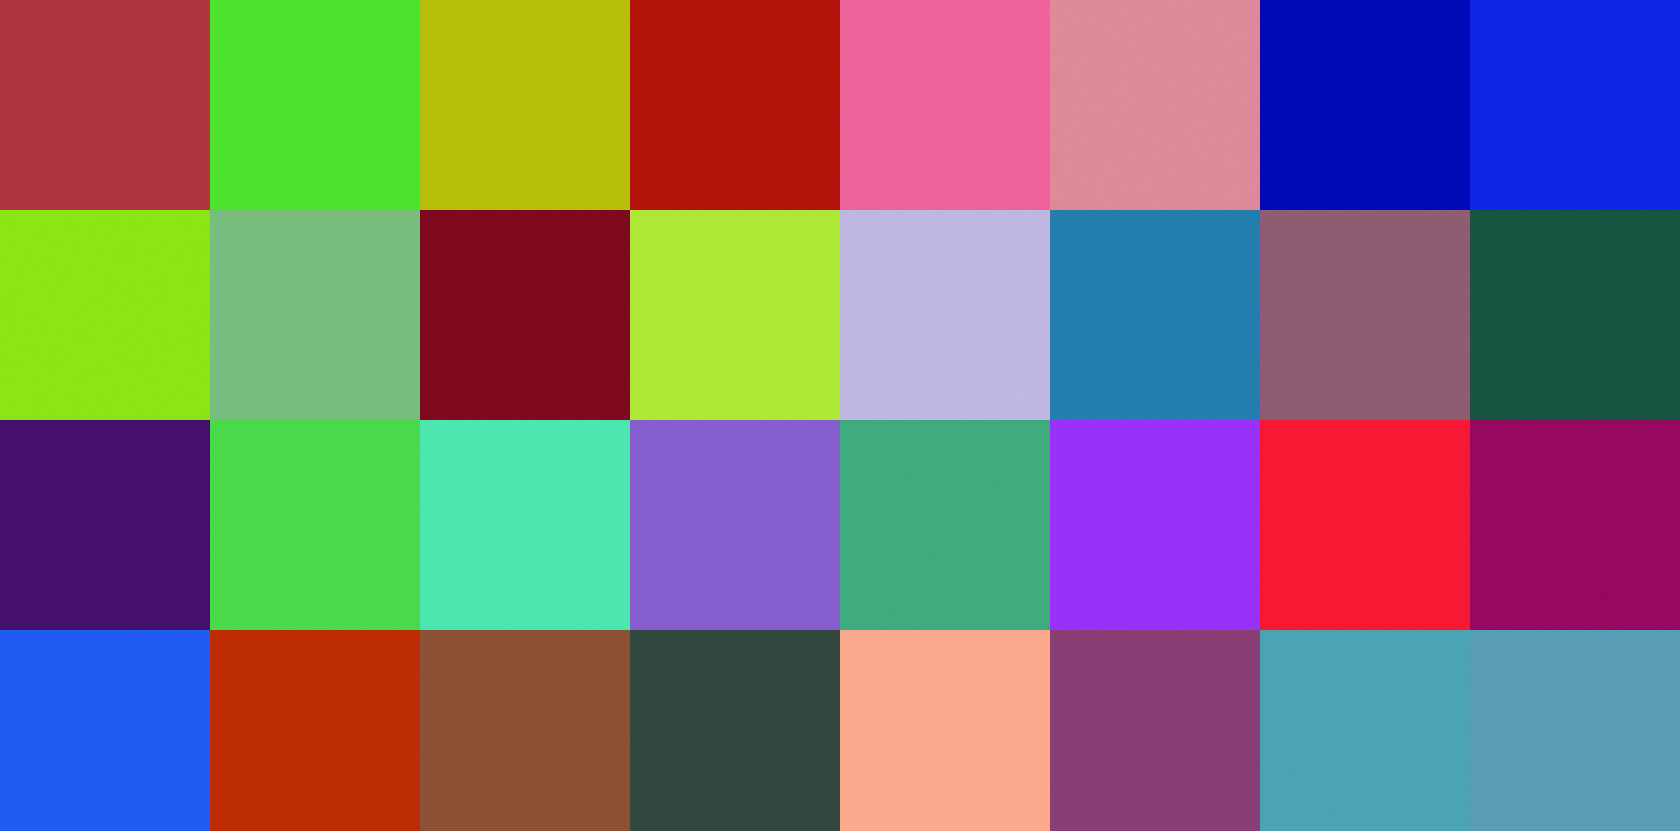 16 Millionen Farben | www.youdid-design.de